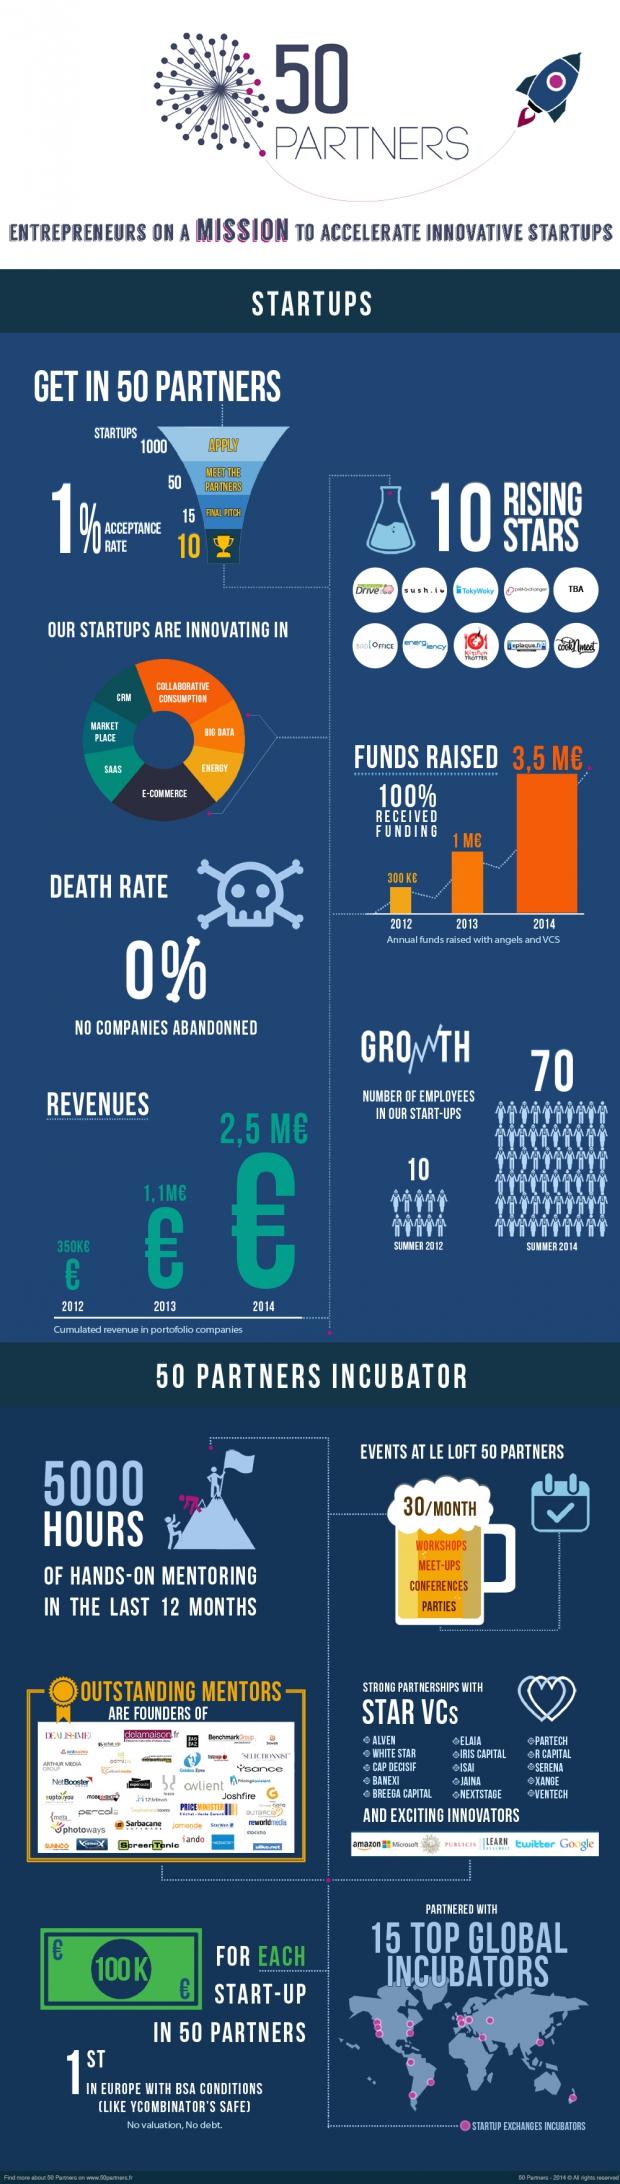 50 partners chiffres